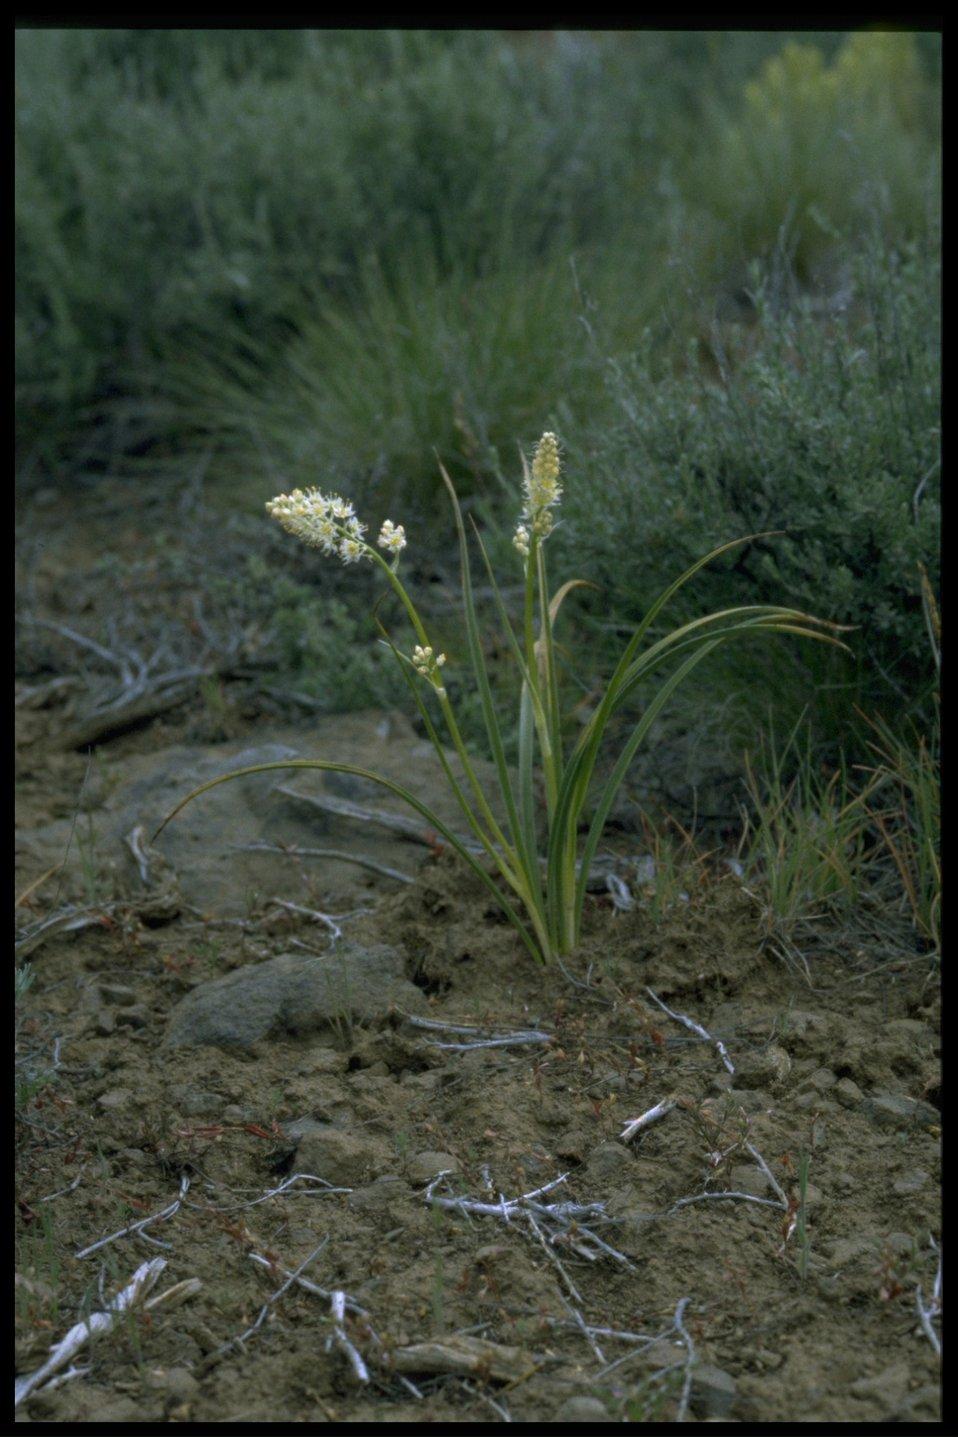 Farshot of meadow deathcamas (Zigadenus venenosus).